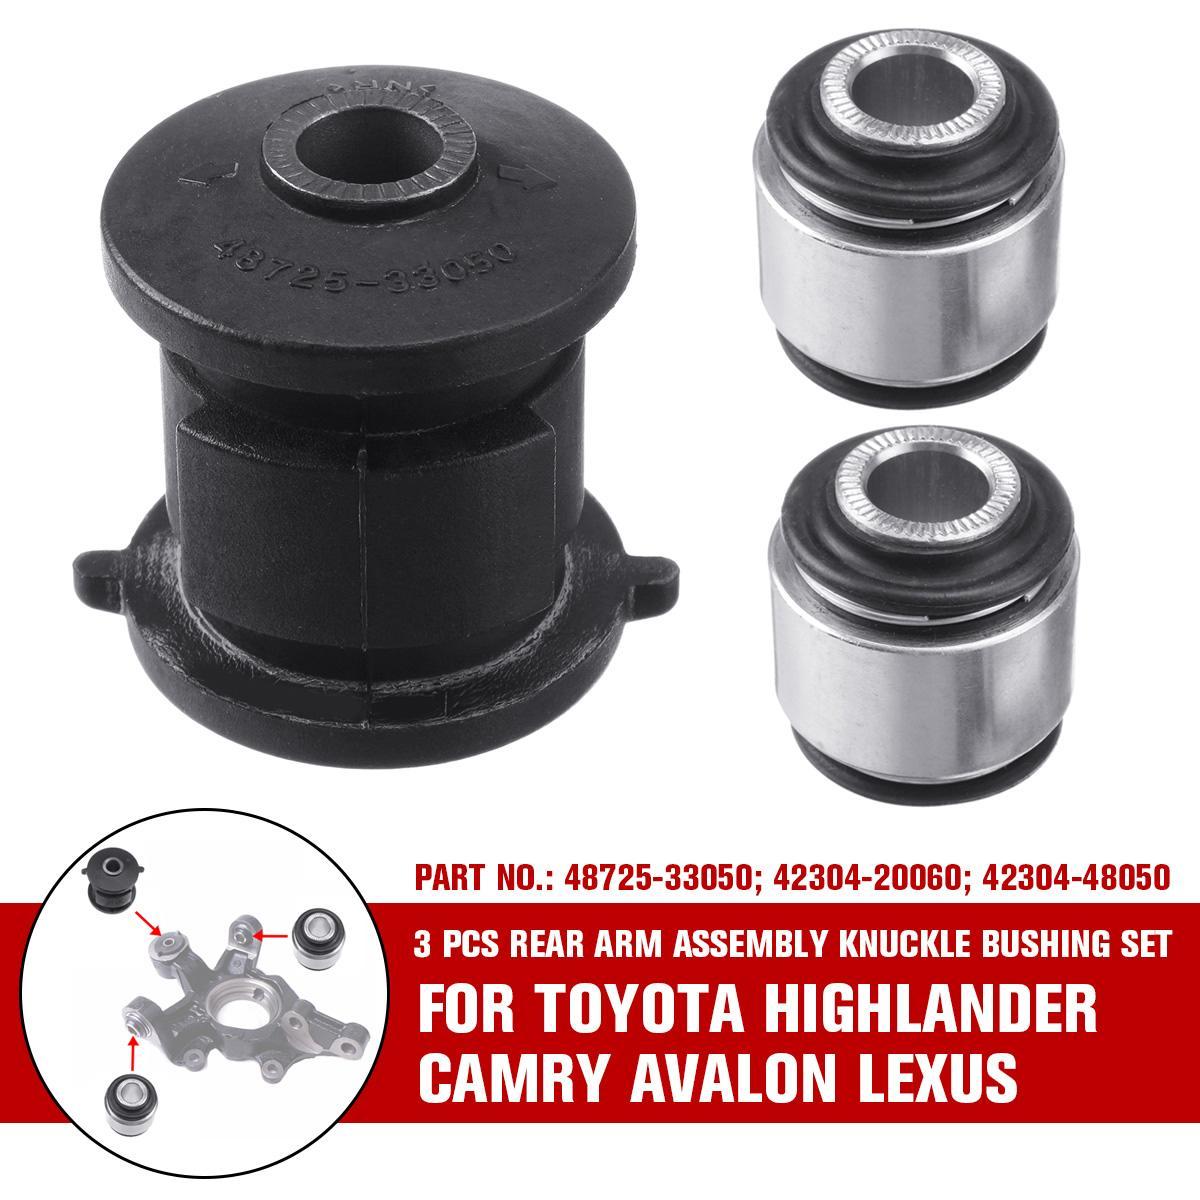 3Pcs Rear Arm Assembly Knuckle Bushing Fits Toyota Highlander Camry Lexus